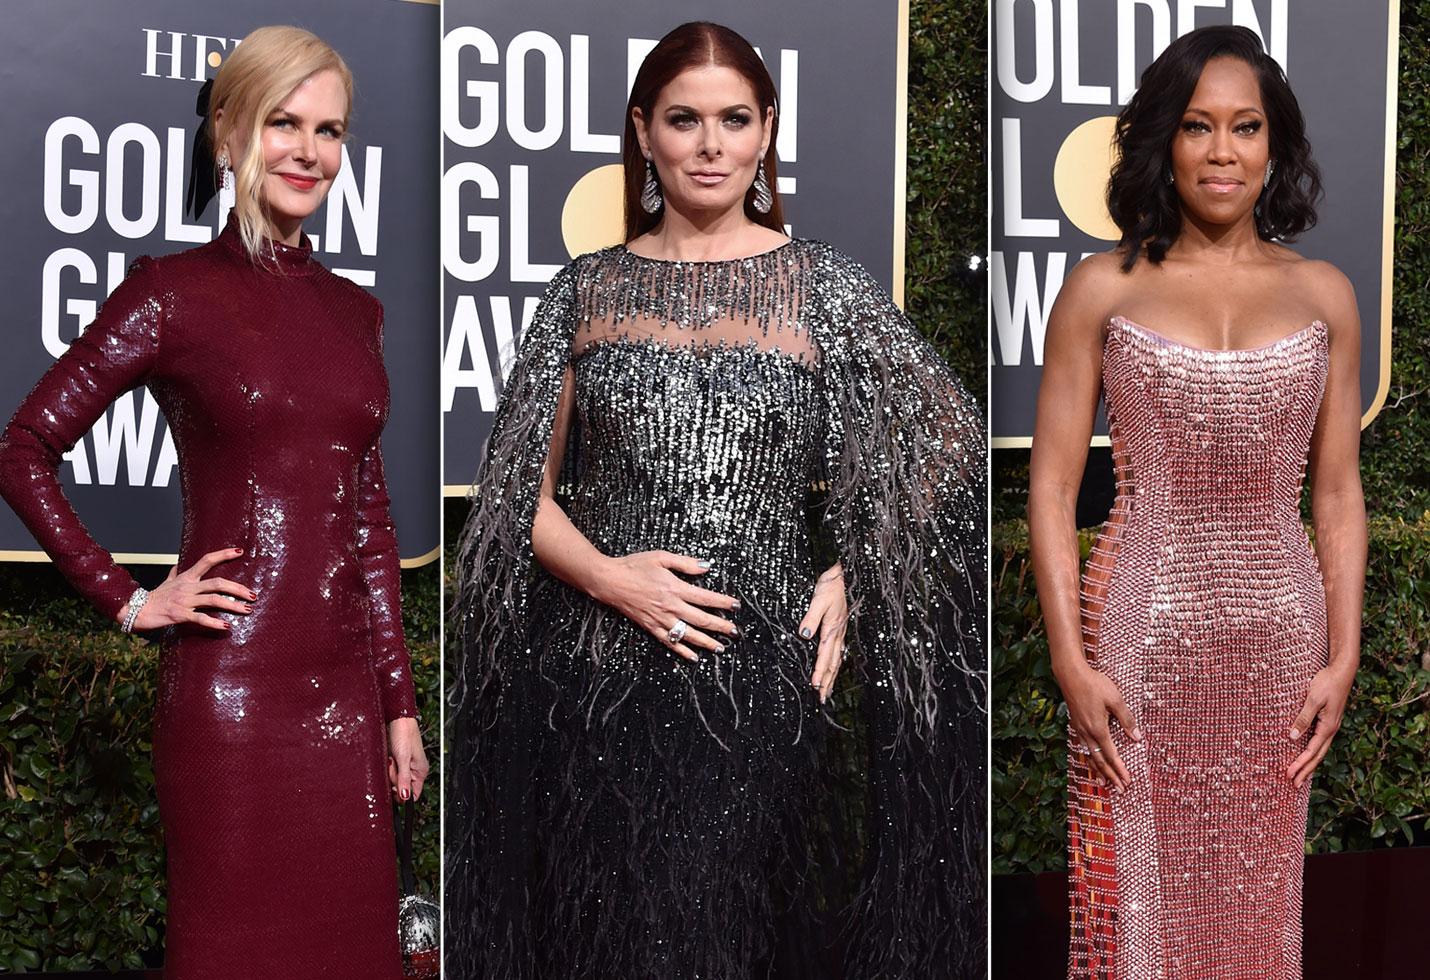 Best Dressed Golden Globes 2019 Golden Globes Red Carpet 2019: The 22 Best Dressed Celebrities